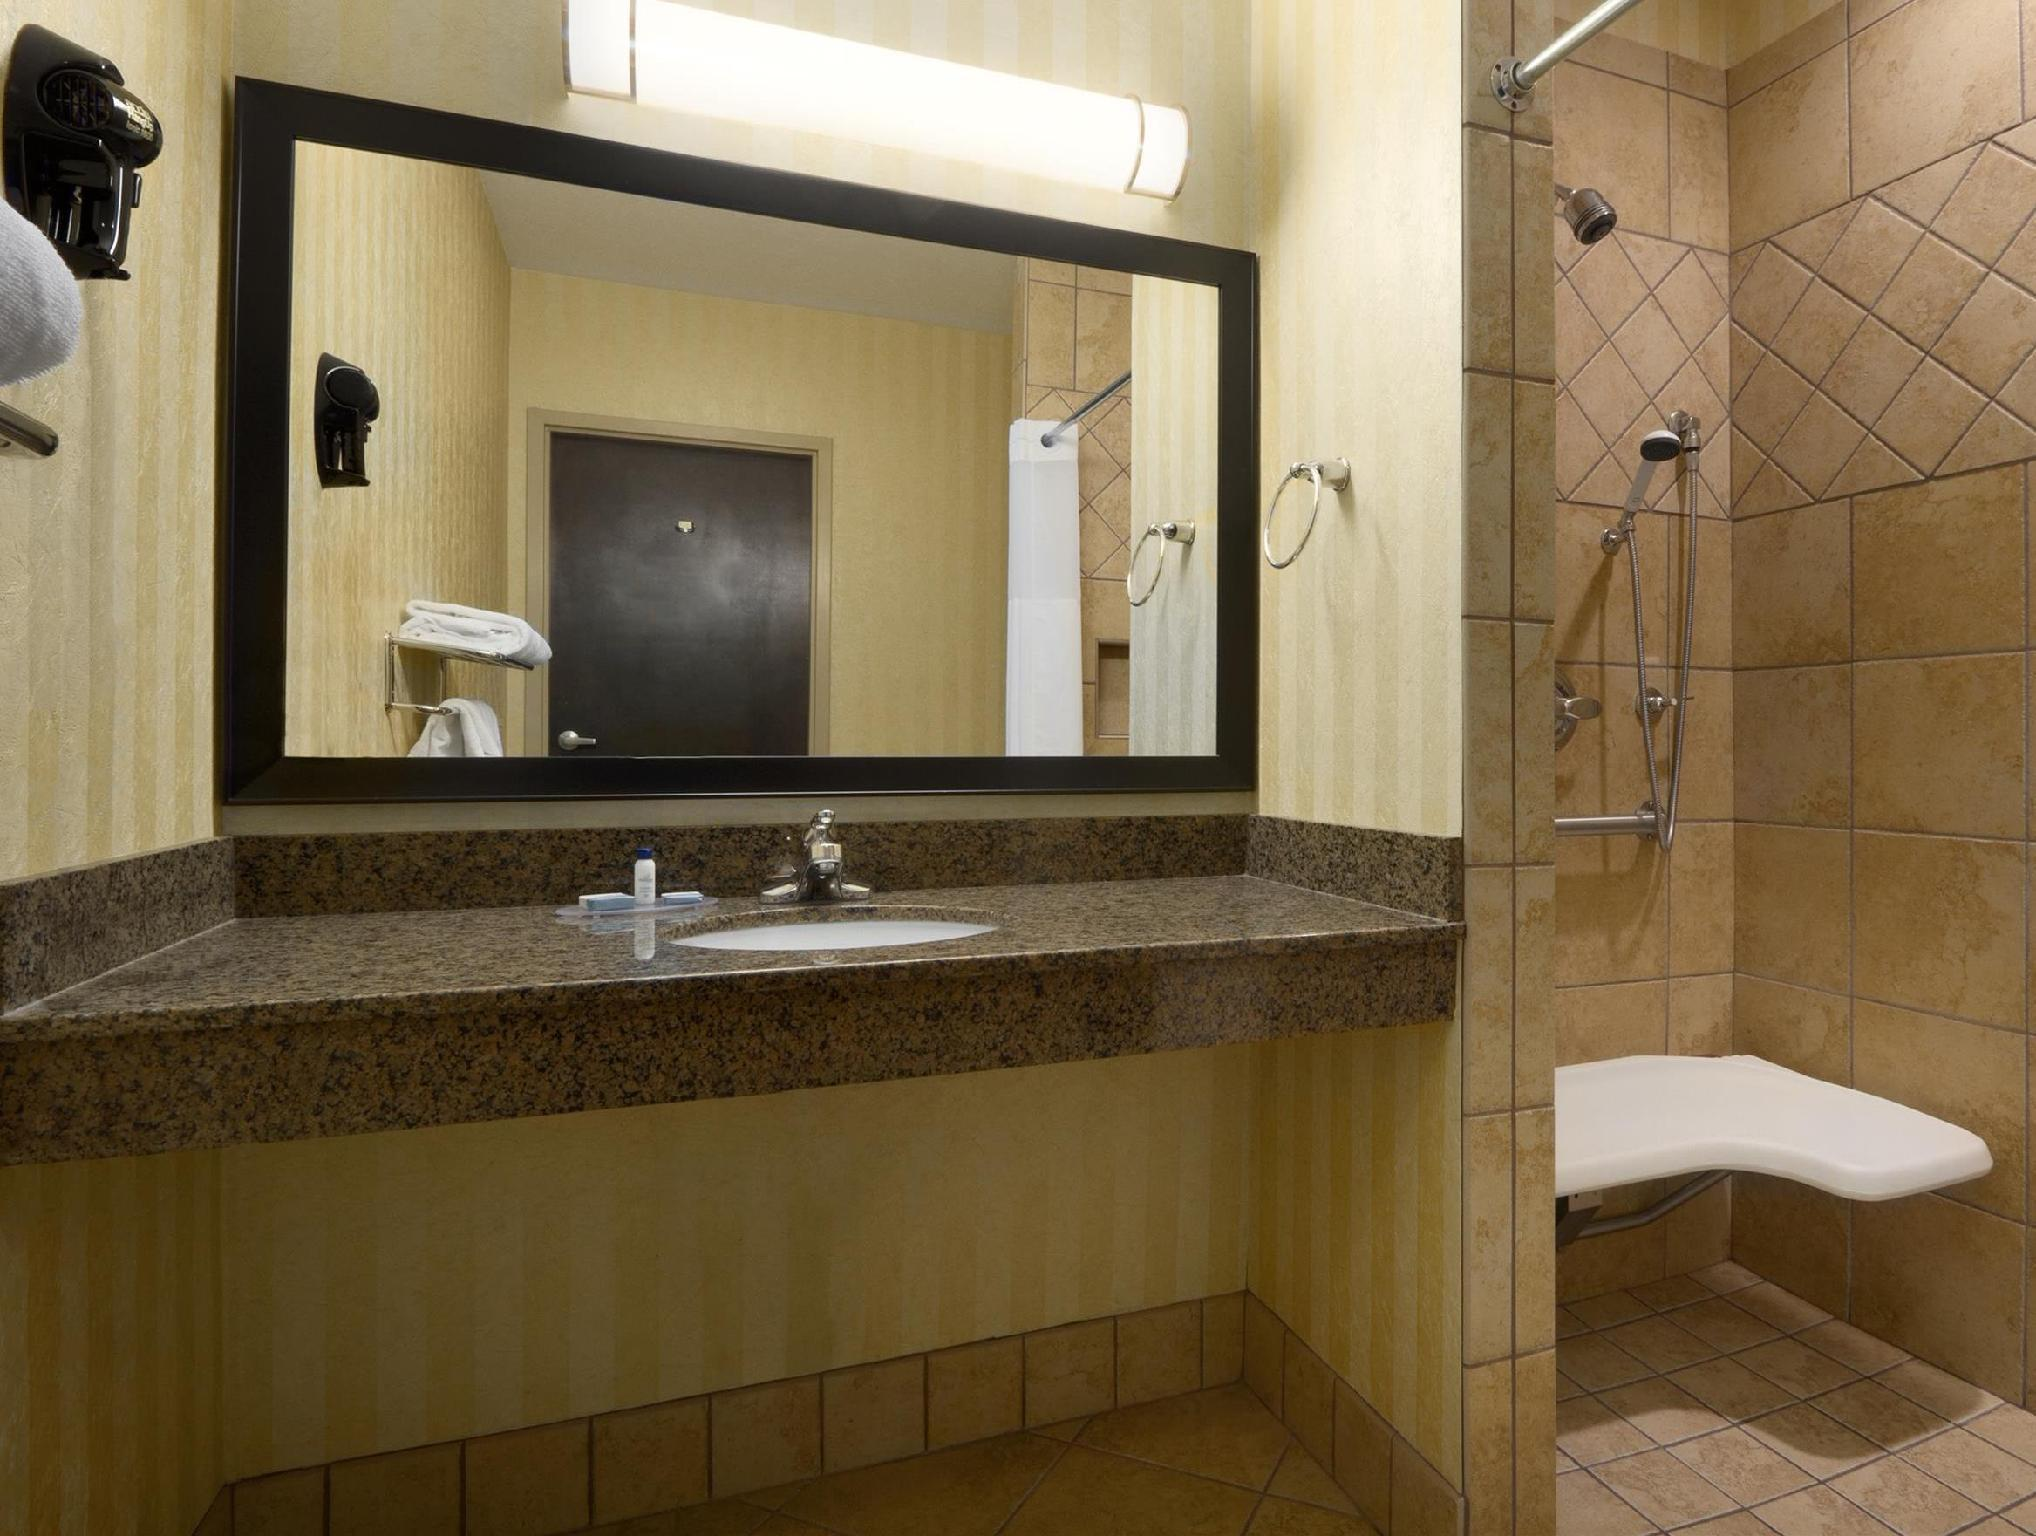 Roll In Shower 1 King Bed Best Western of Asheville Biltmore East